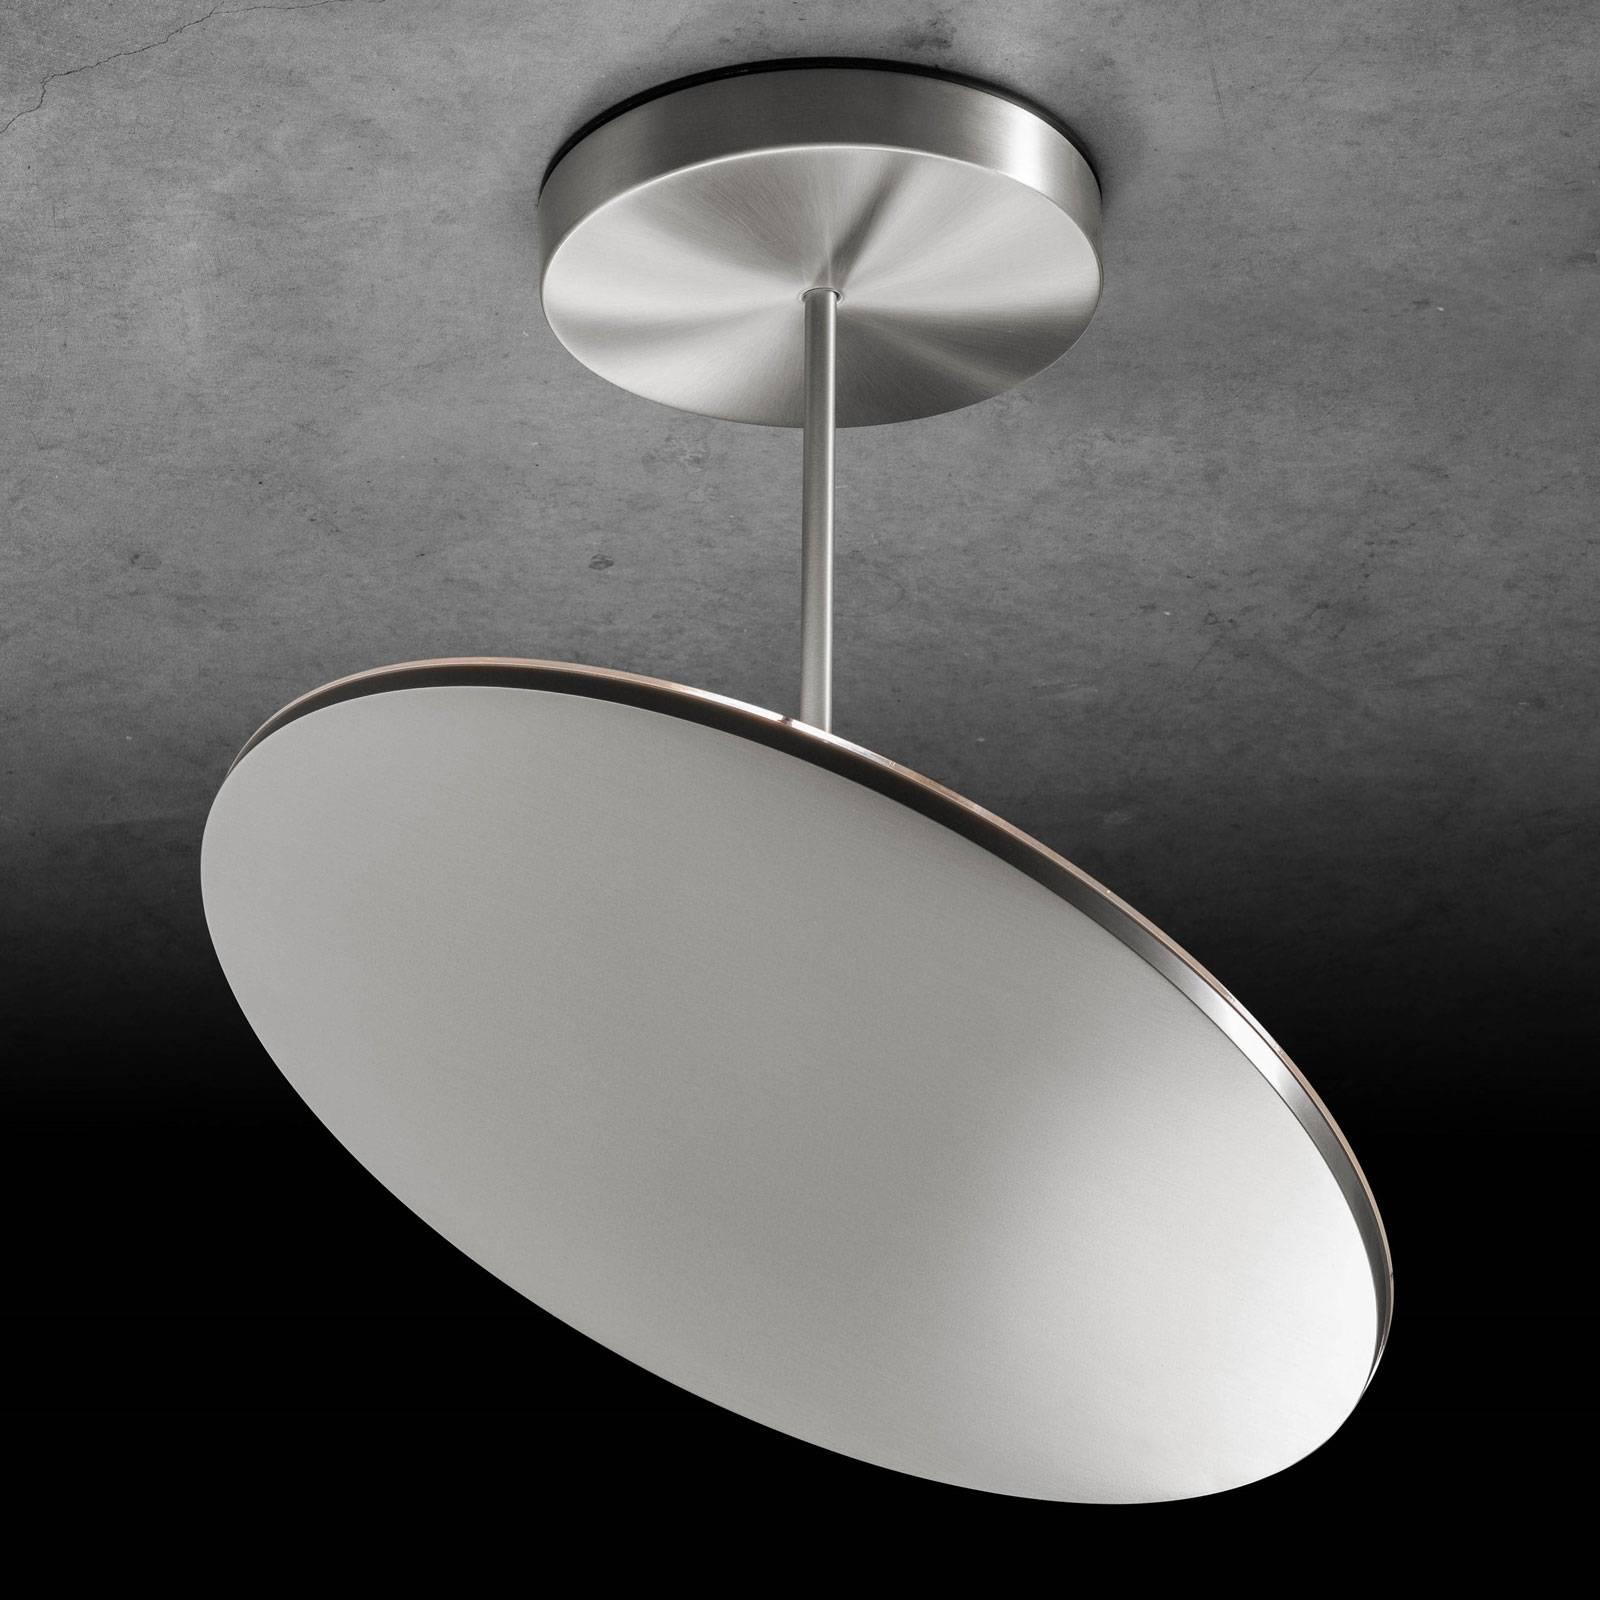 Holtkötter Plano XL LED plafondlamp mat alu